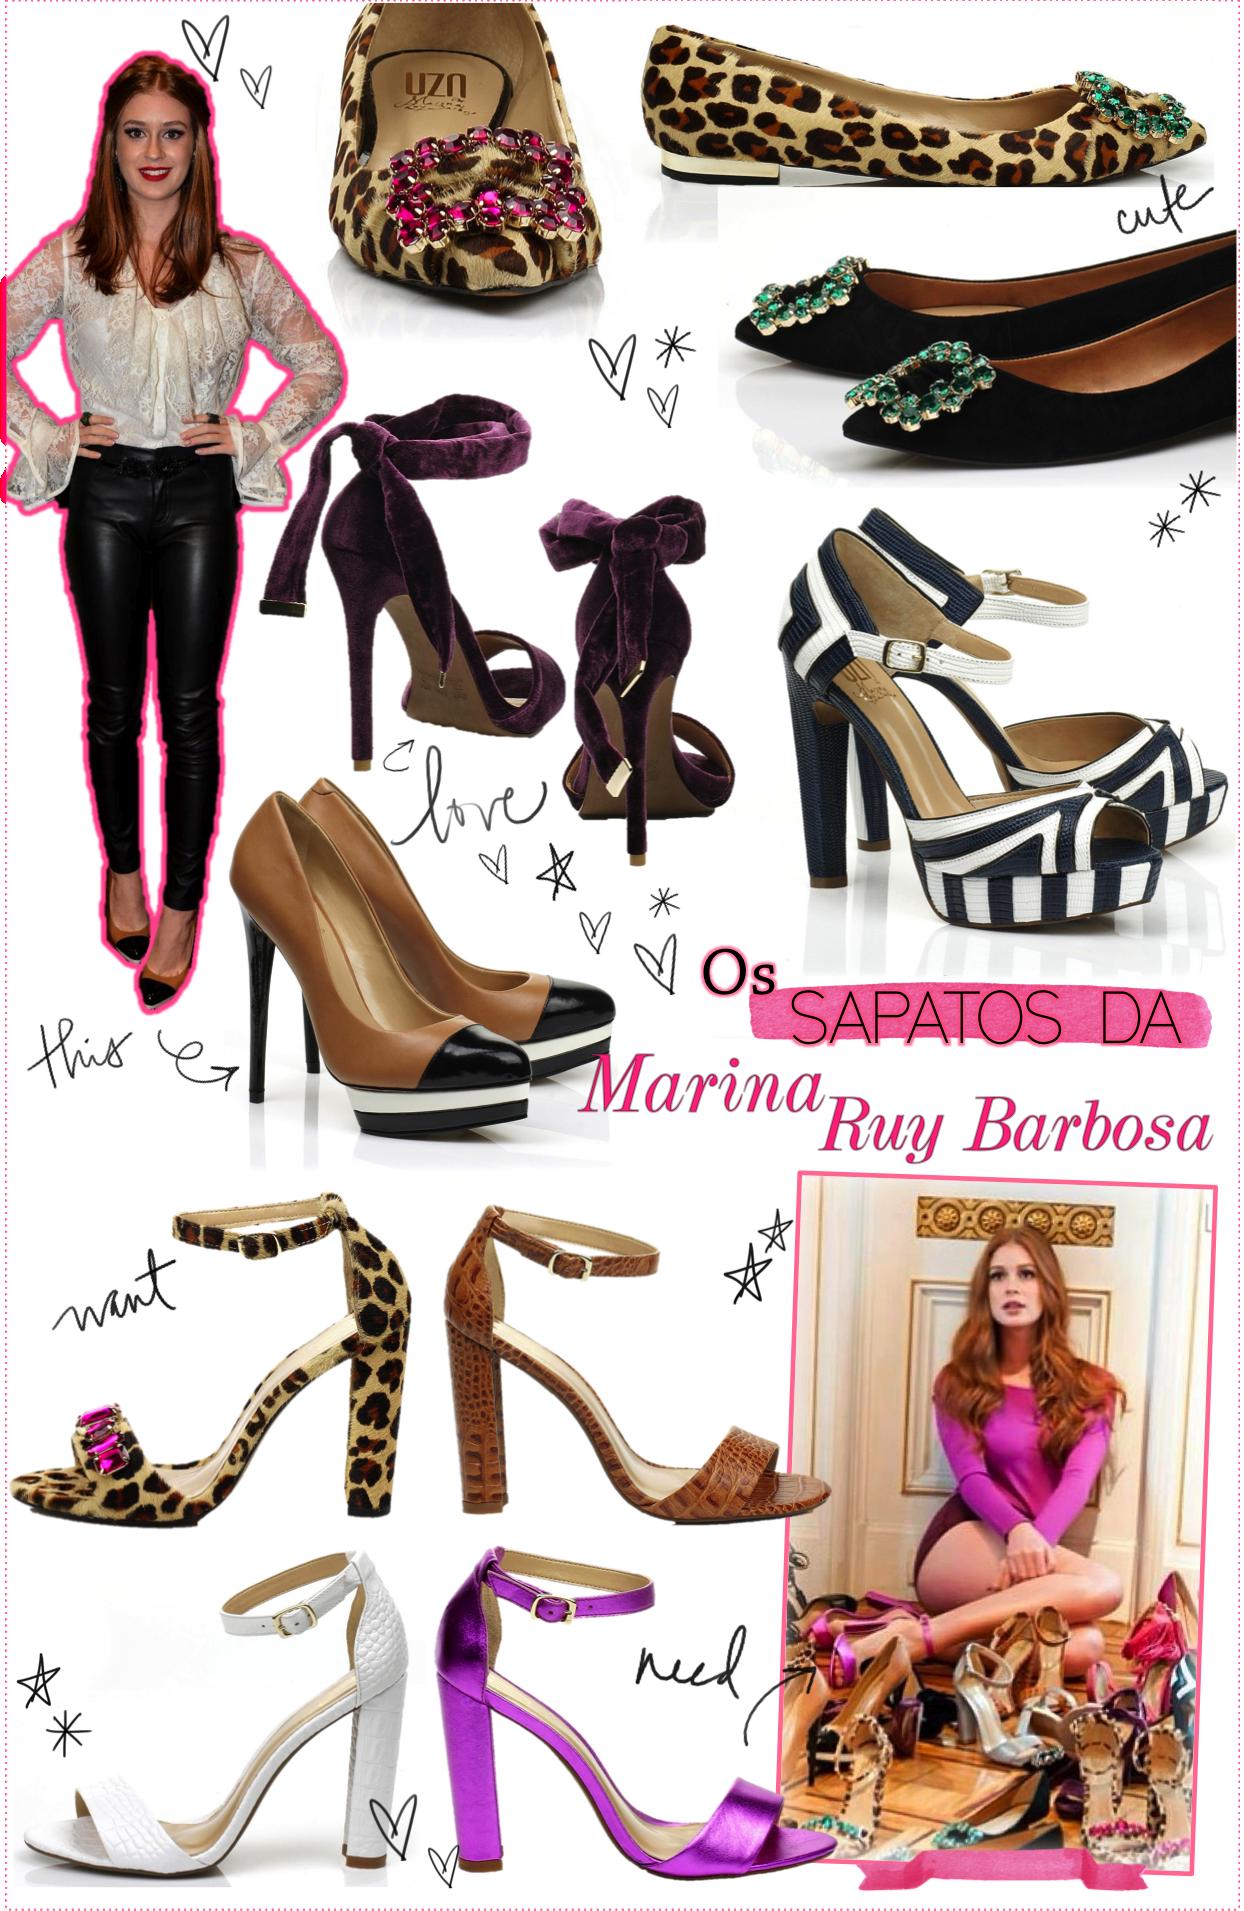 sapatos-marina-ruy-barbosa-uza